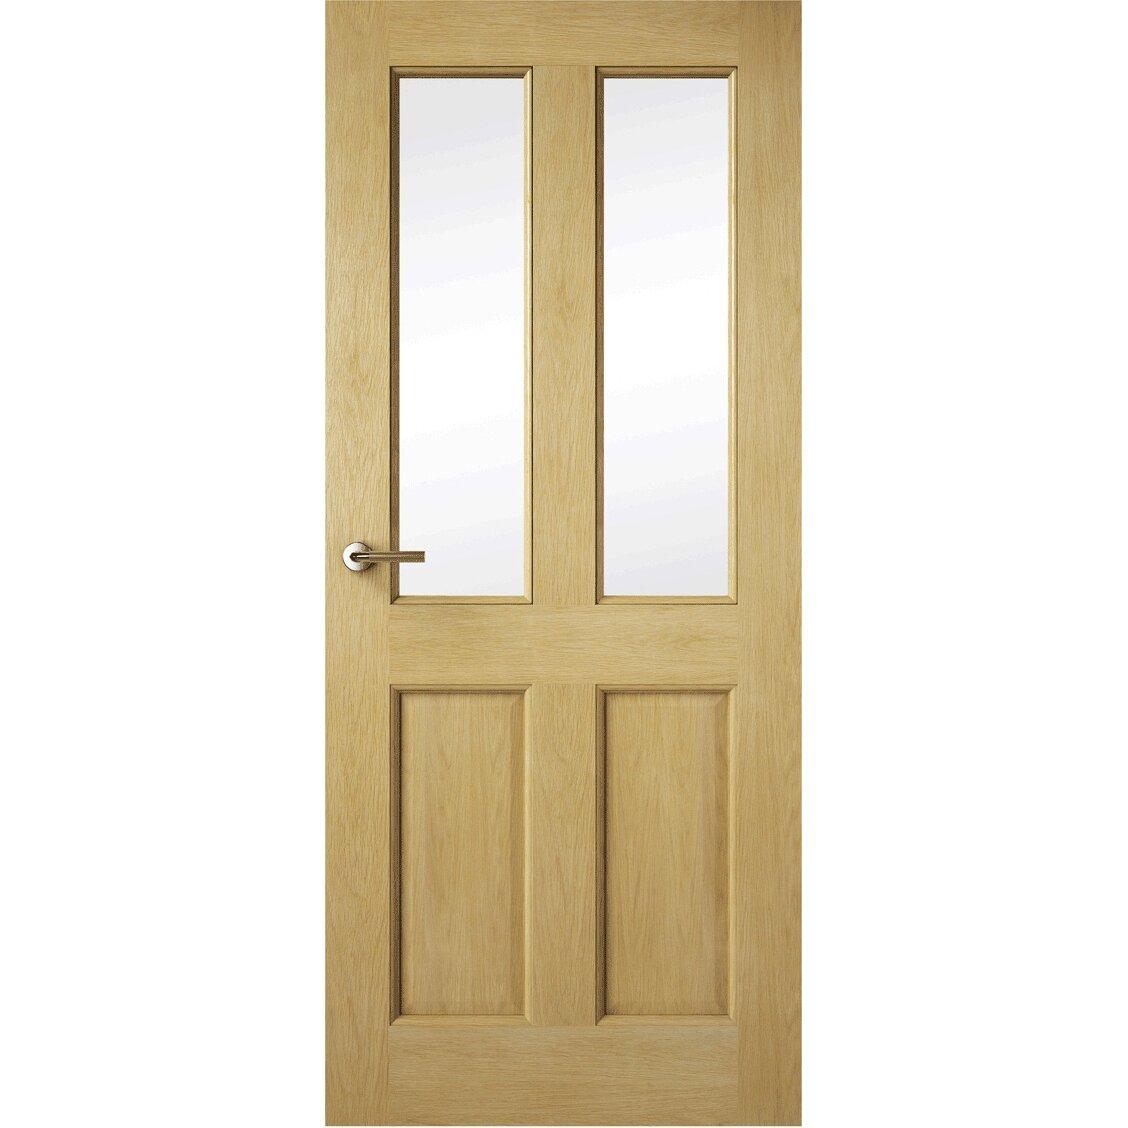 premdor oak glazed internal door reviews wayfair uk. Black Bedroom Furniture Sets. Home Design Ideas